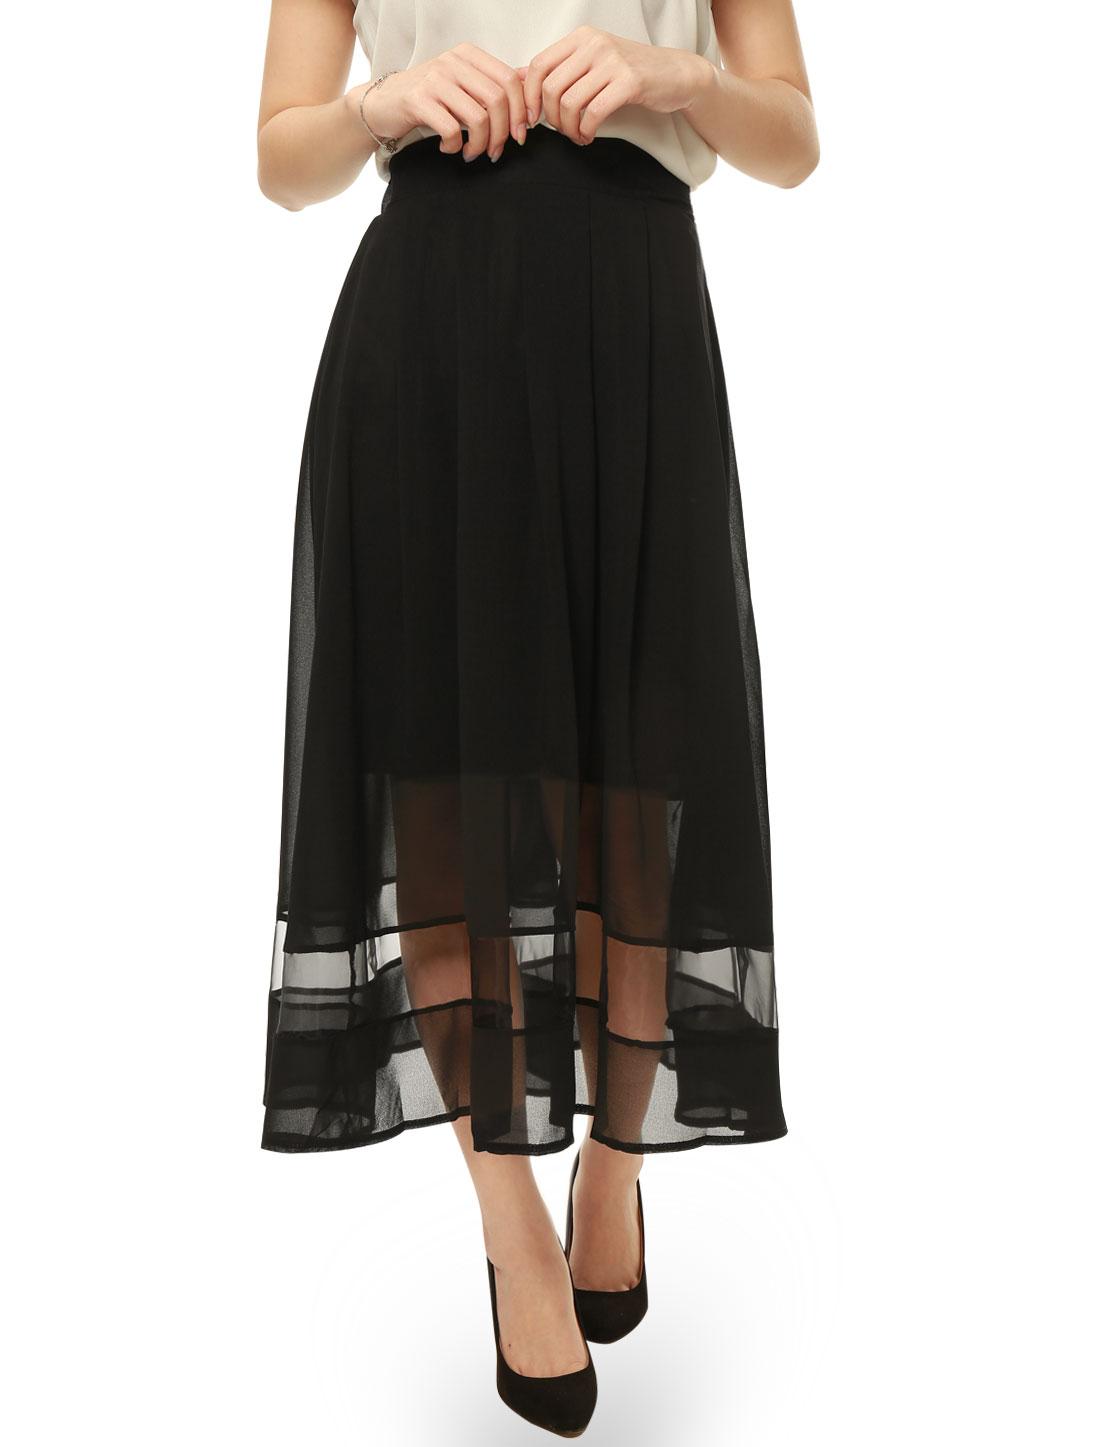 Women Elastic Waist Organza Panel Chiffon Pleated Skirt Black XS